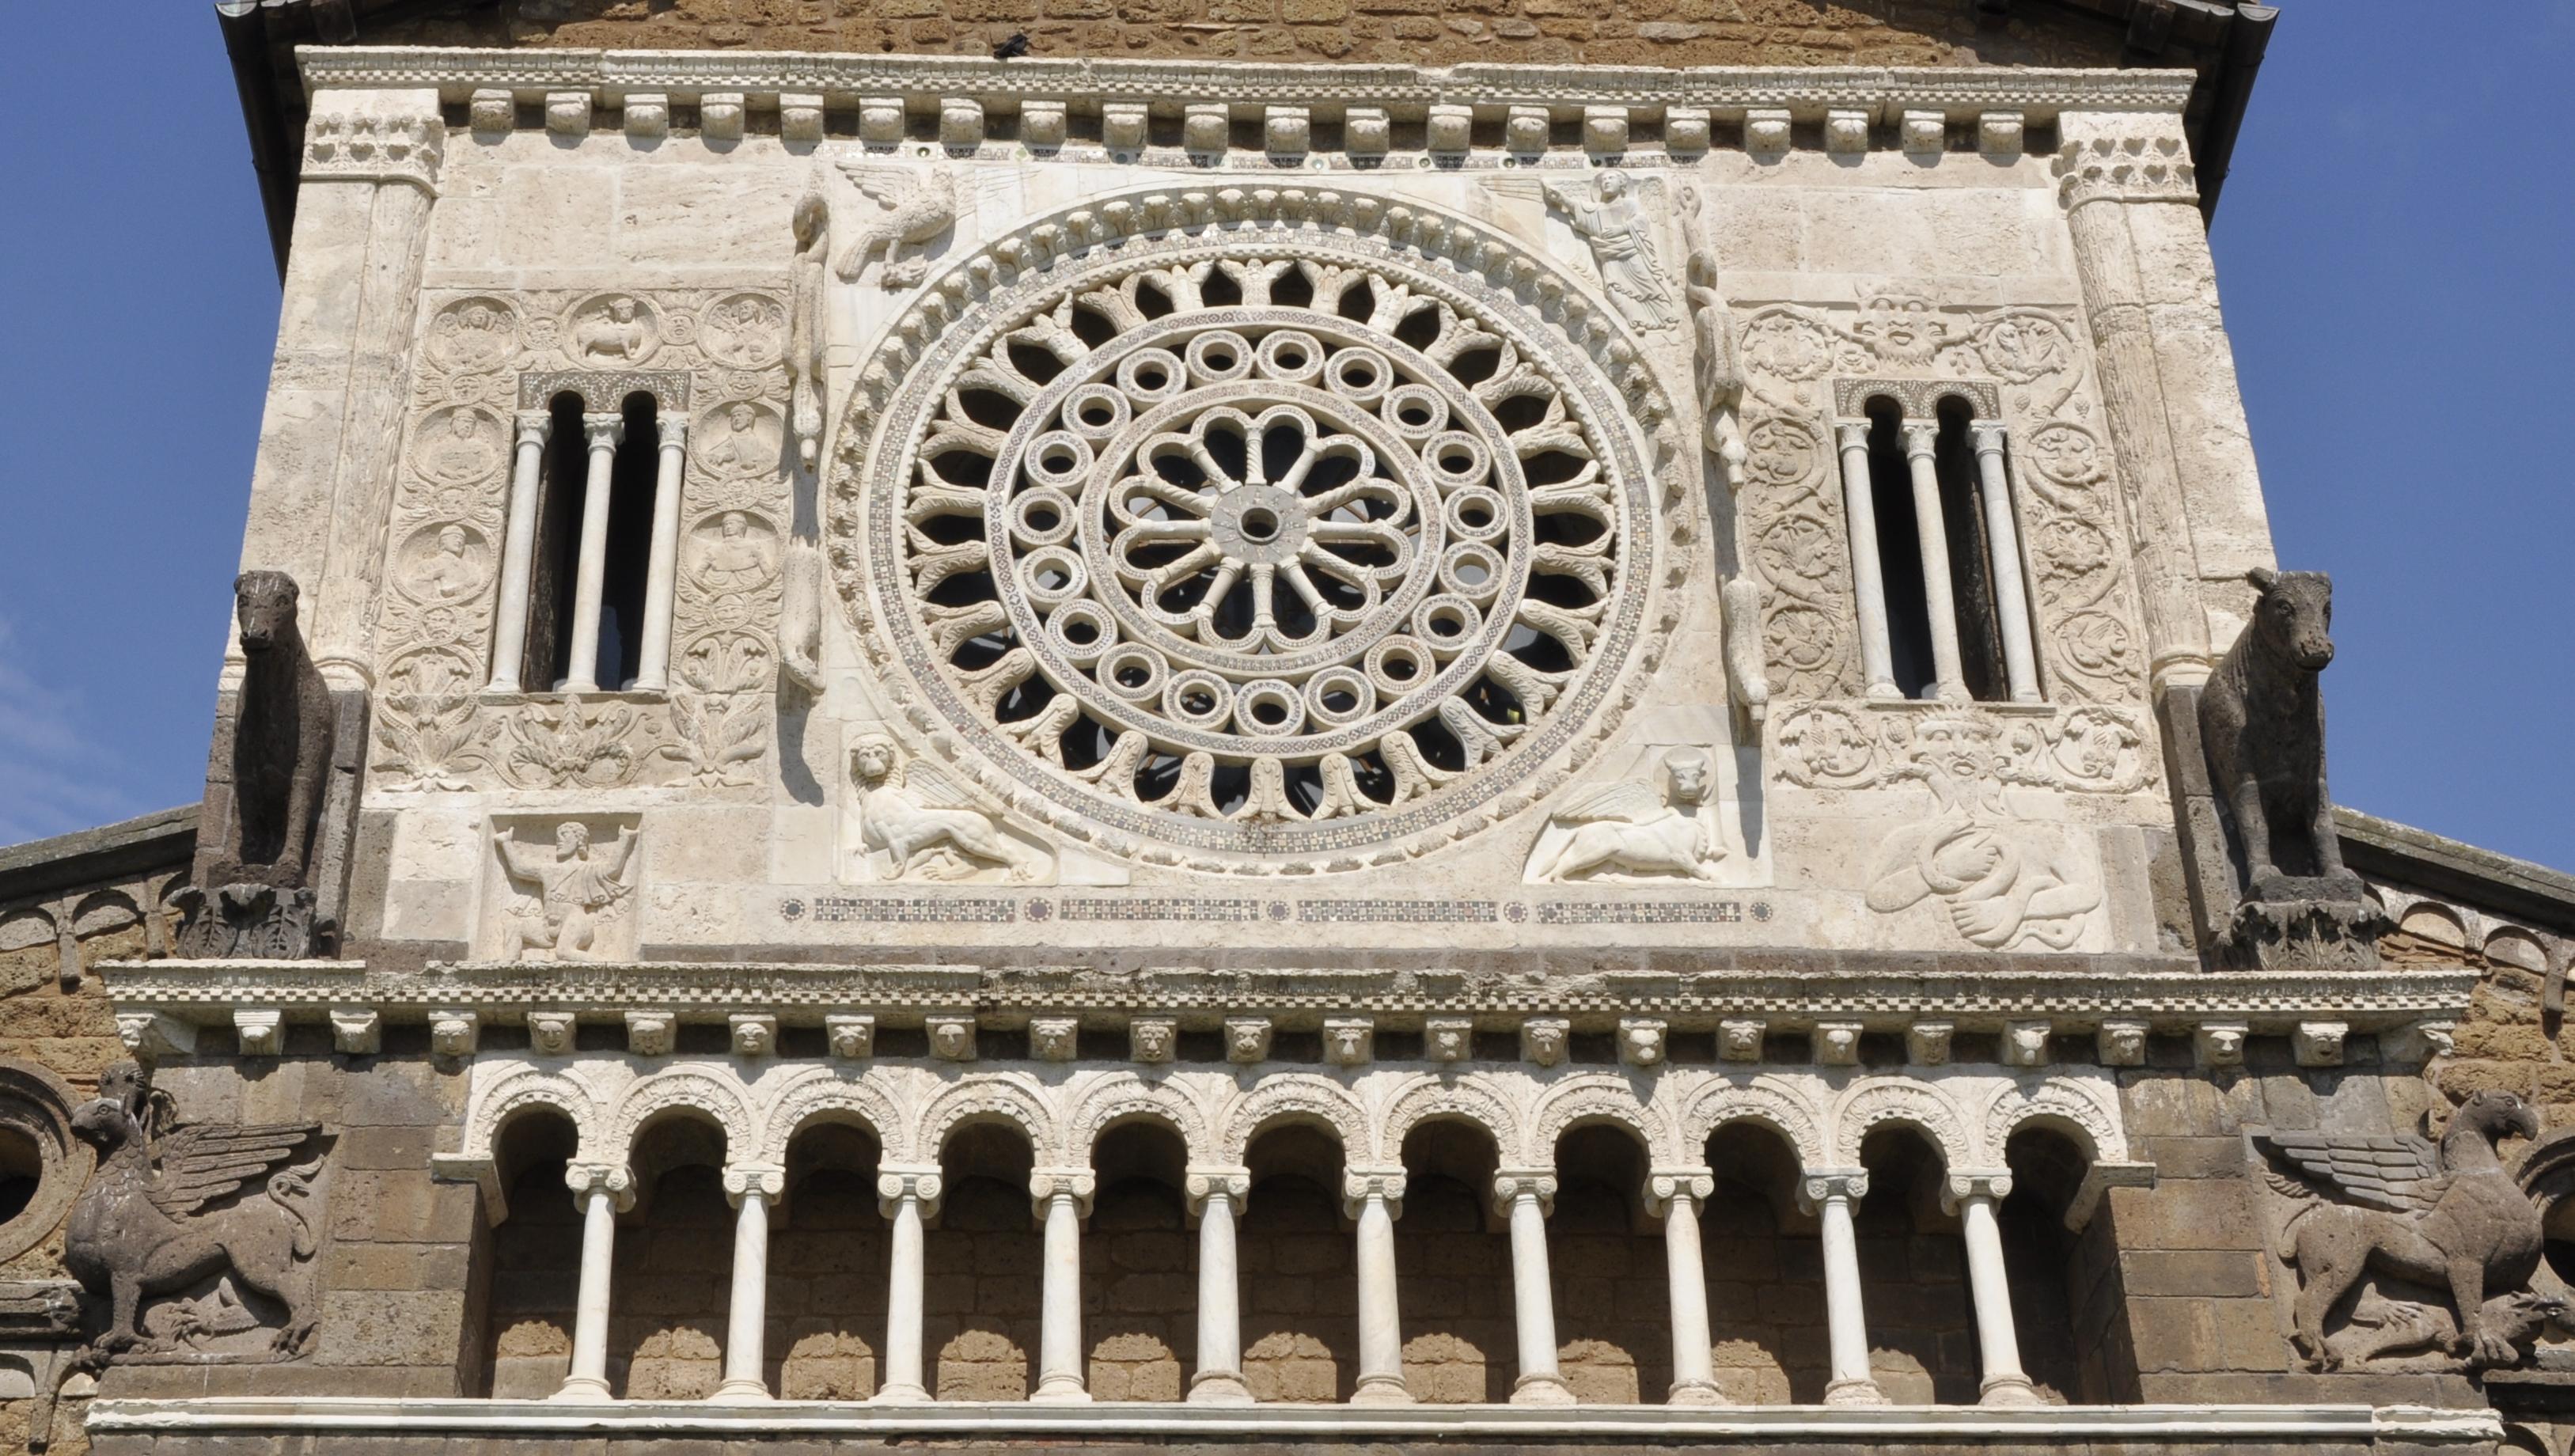 Luoghi da visitare - Facciata Chiesa di San Pietro - Tuscania - Tuscaniainfo.it